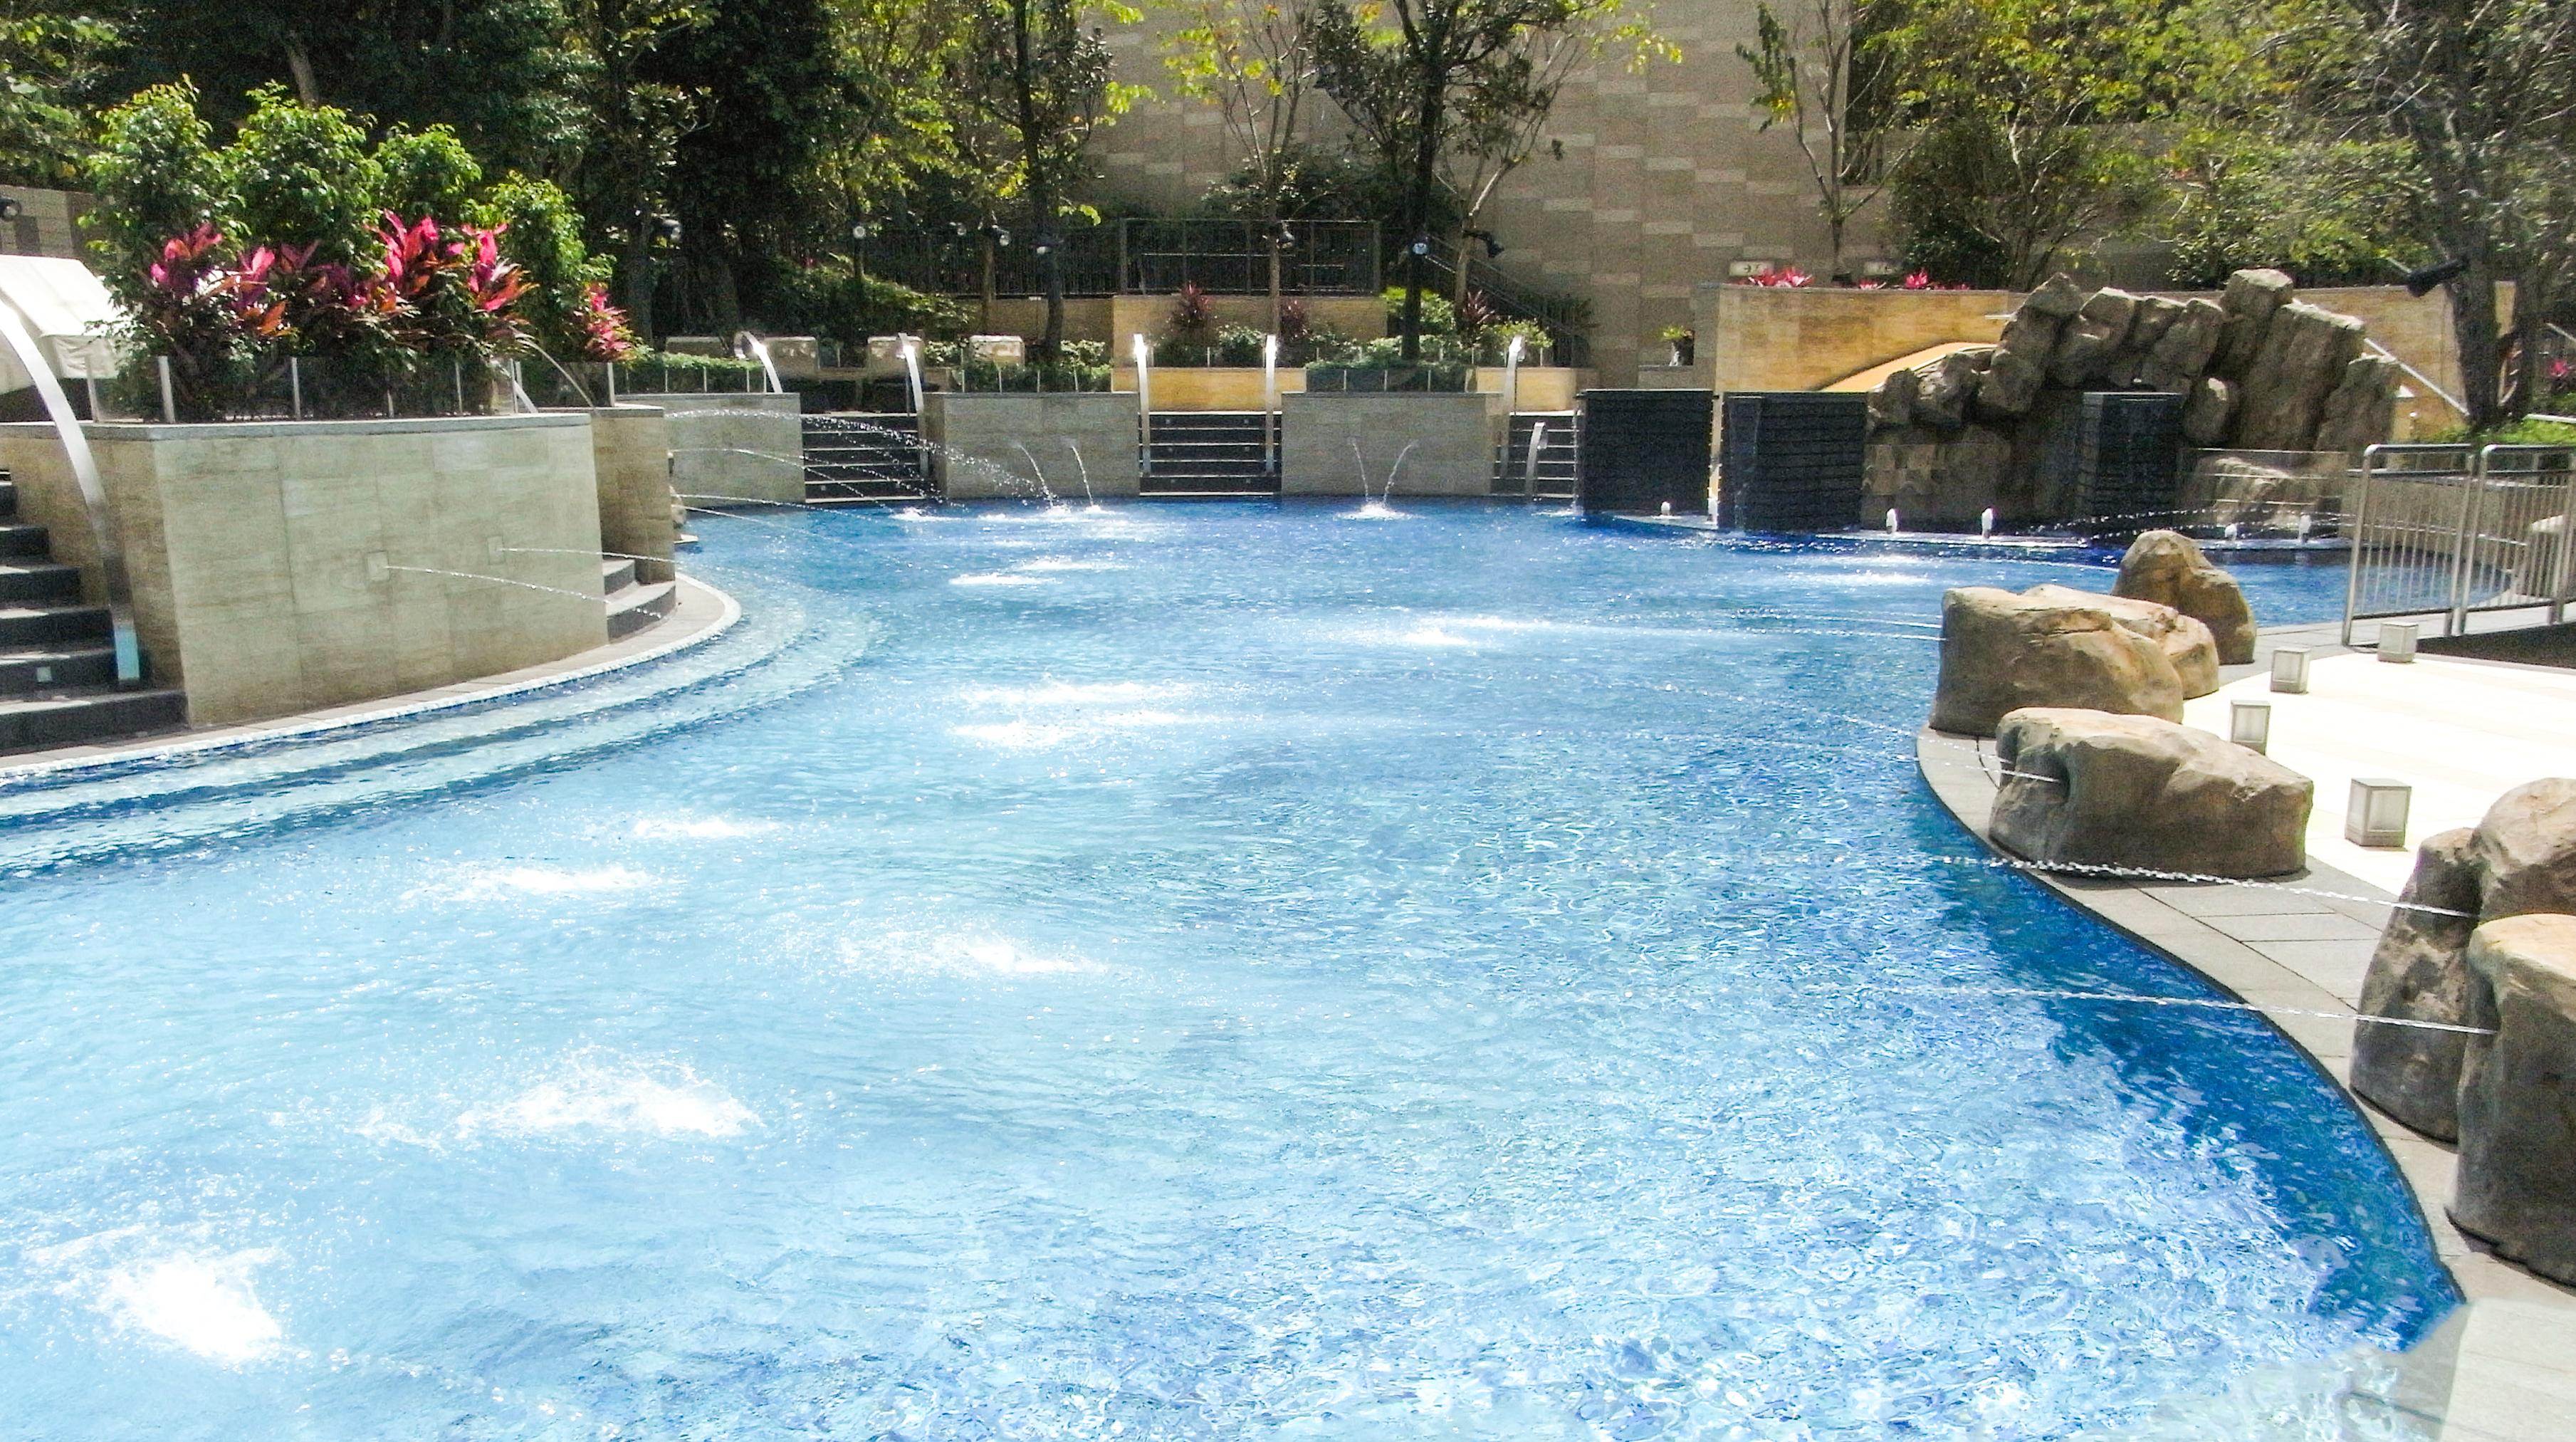 File Hk Tai Wai Hill Paramount Club House Swimming Pool April 2011 Jpg Wikimedia Commons